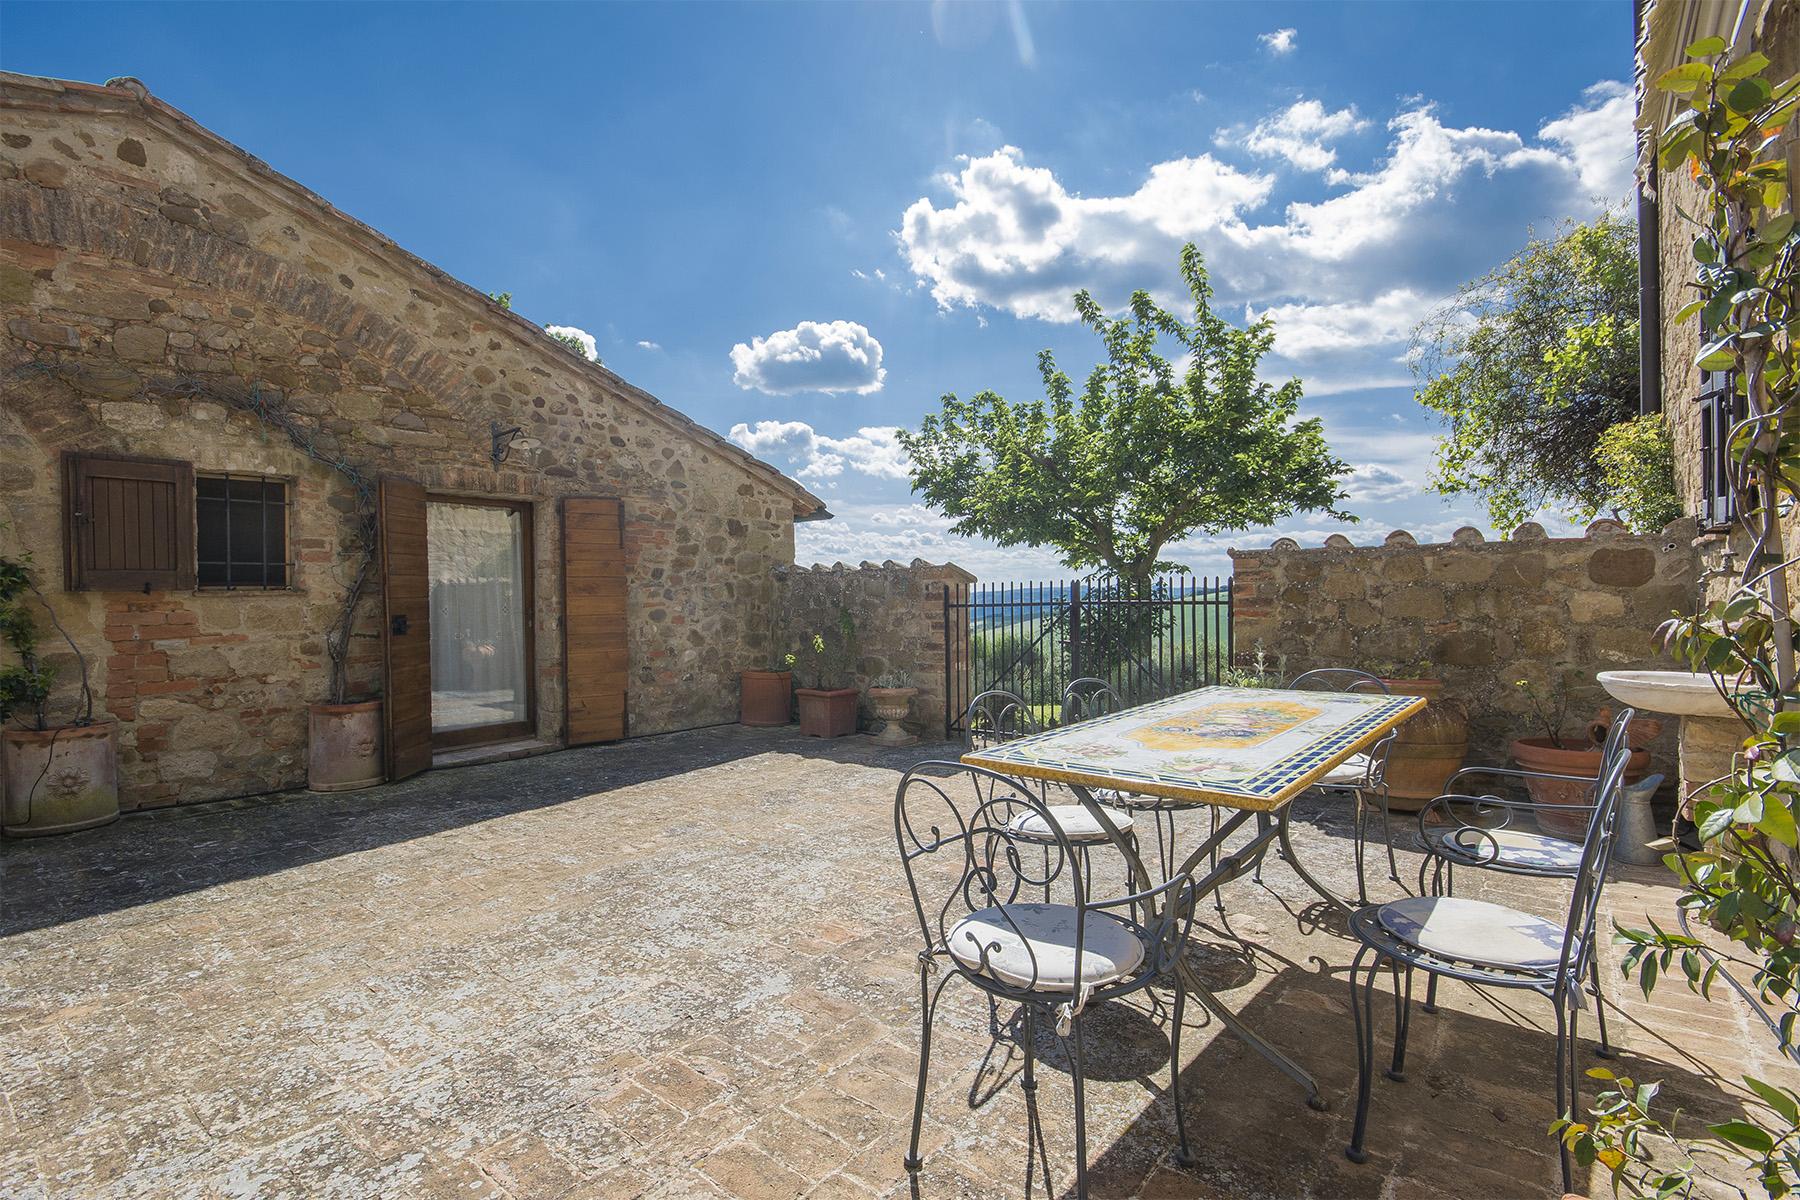 Casa indipendente in Vendita a Pienza: 5 locali, 400 mq - Foto 29